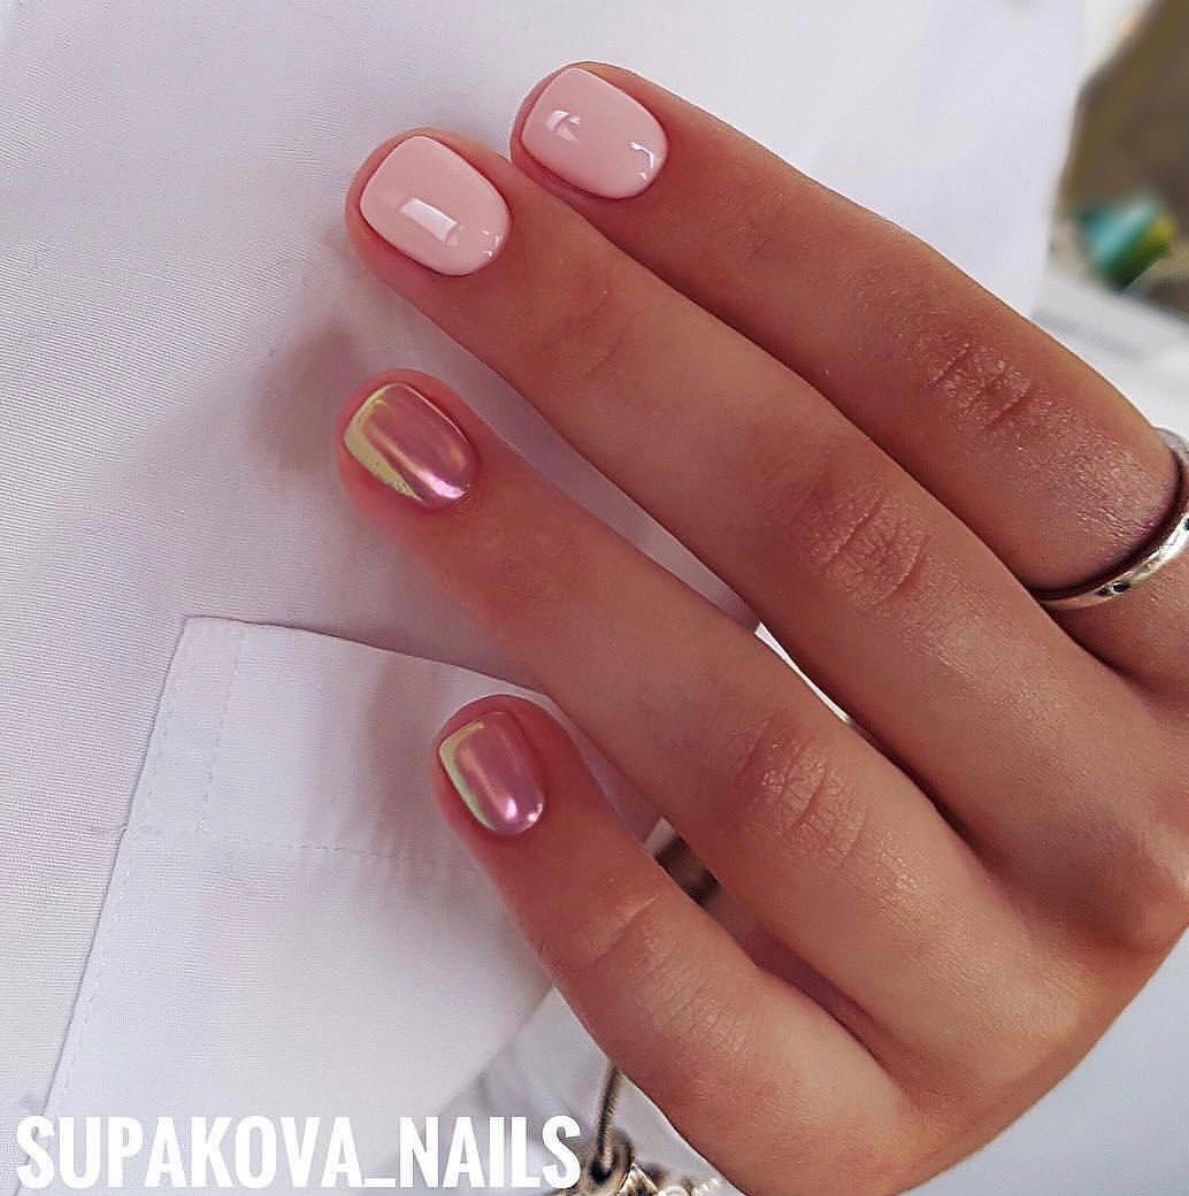 Pin de Sophia Daoudaki en Νύχια | Pinterest | Diseños de uñas ...